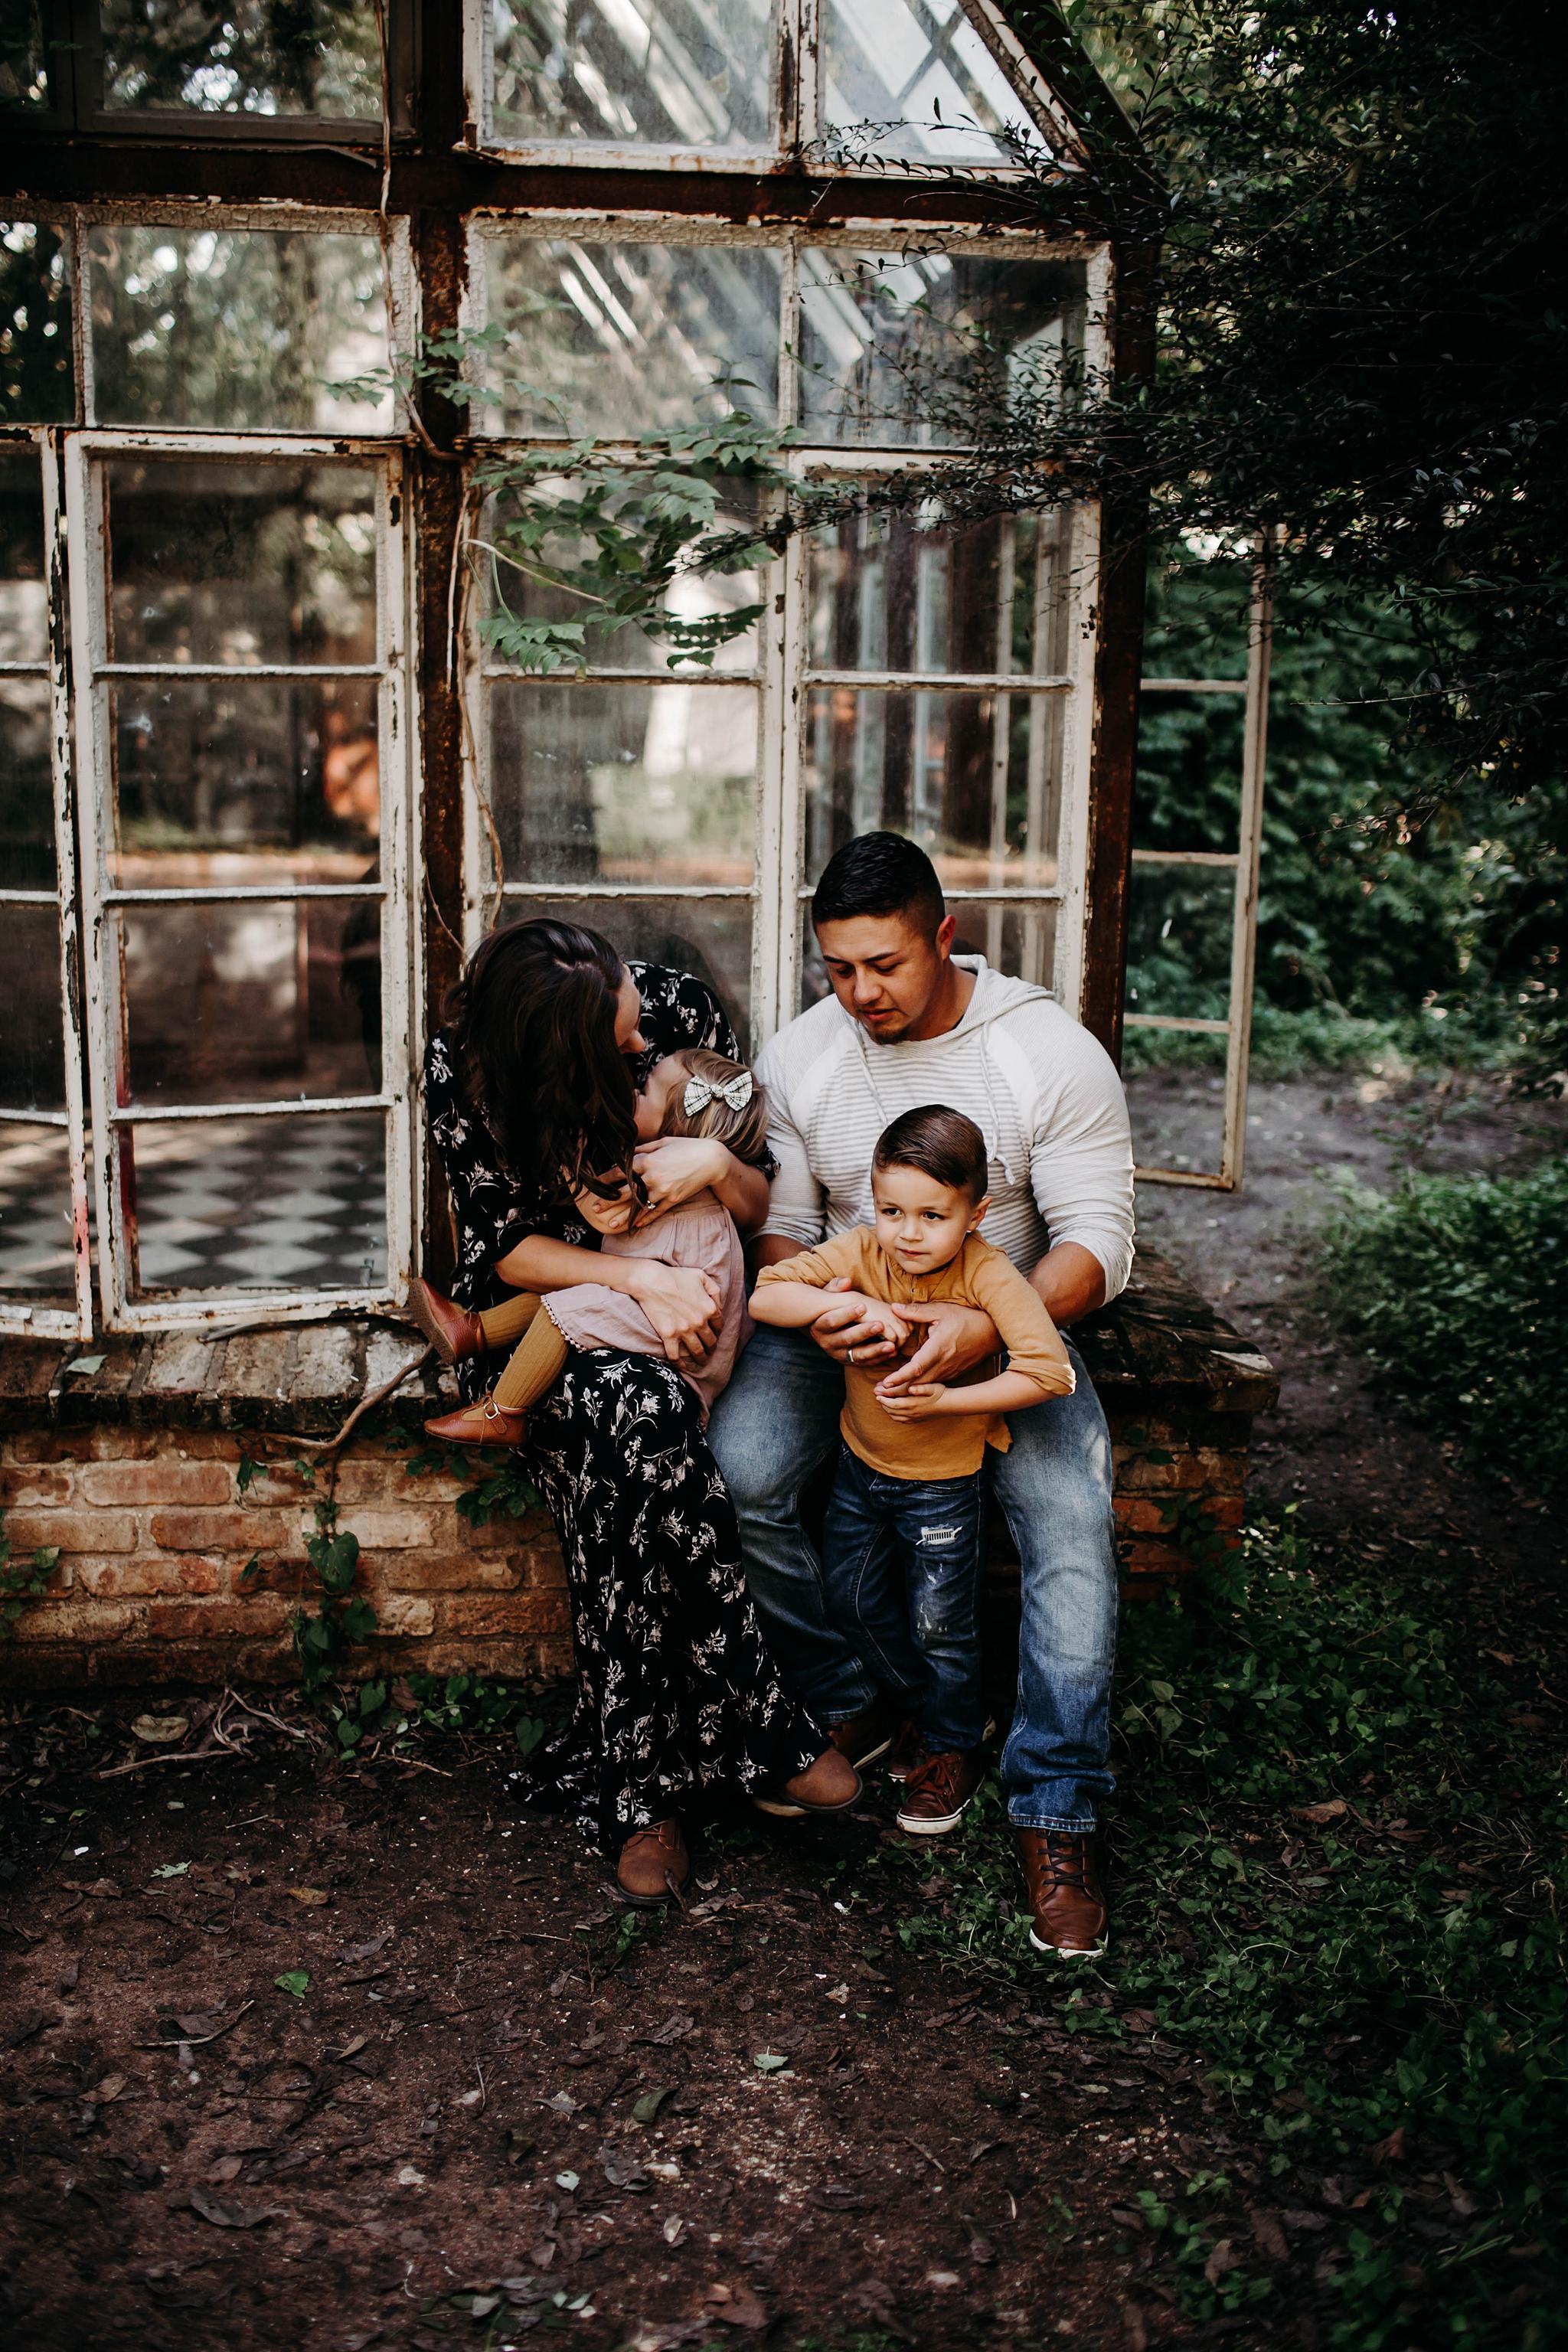 Luera-VMP-San-Antonio-Family-Photography-116_WEB.jpg